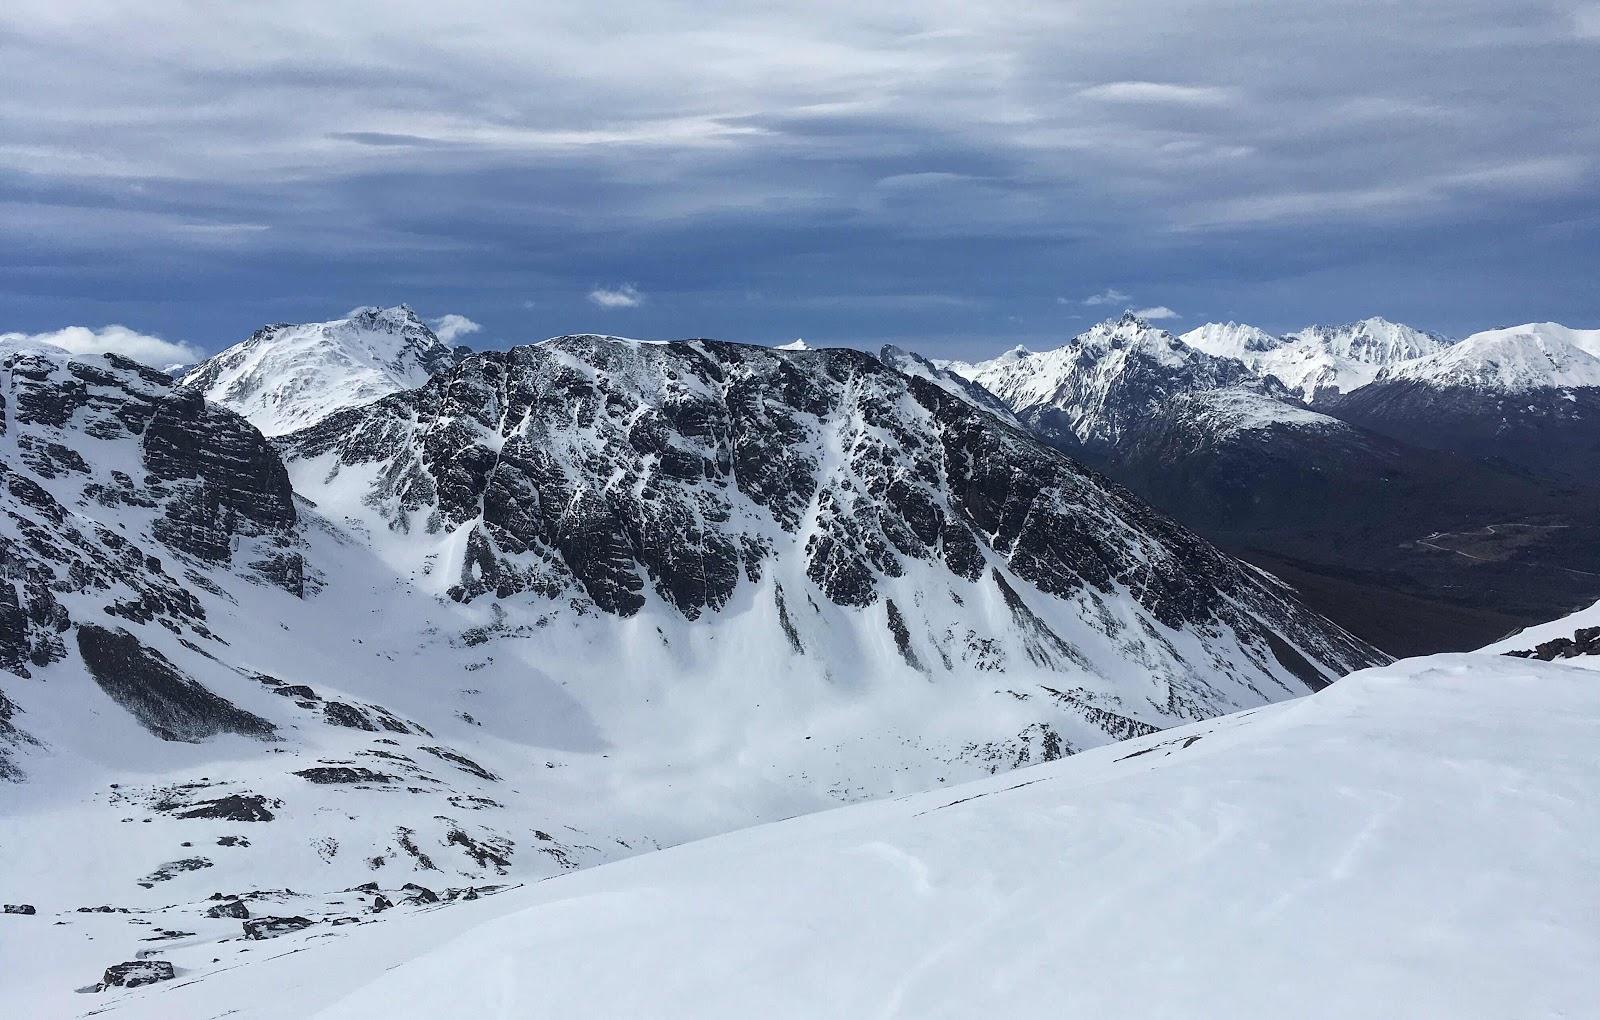 Descending Cerro del Medio. Ushuaia, Argentina